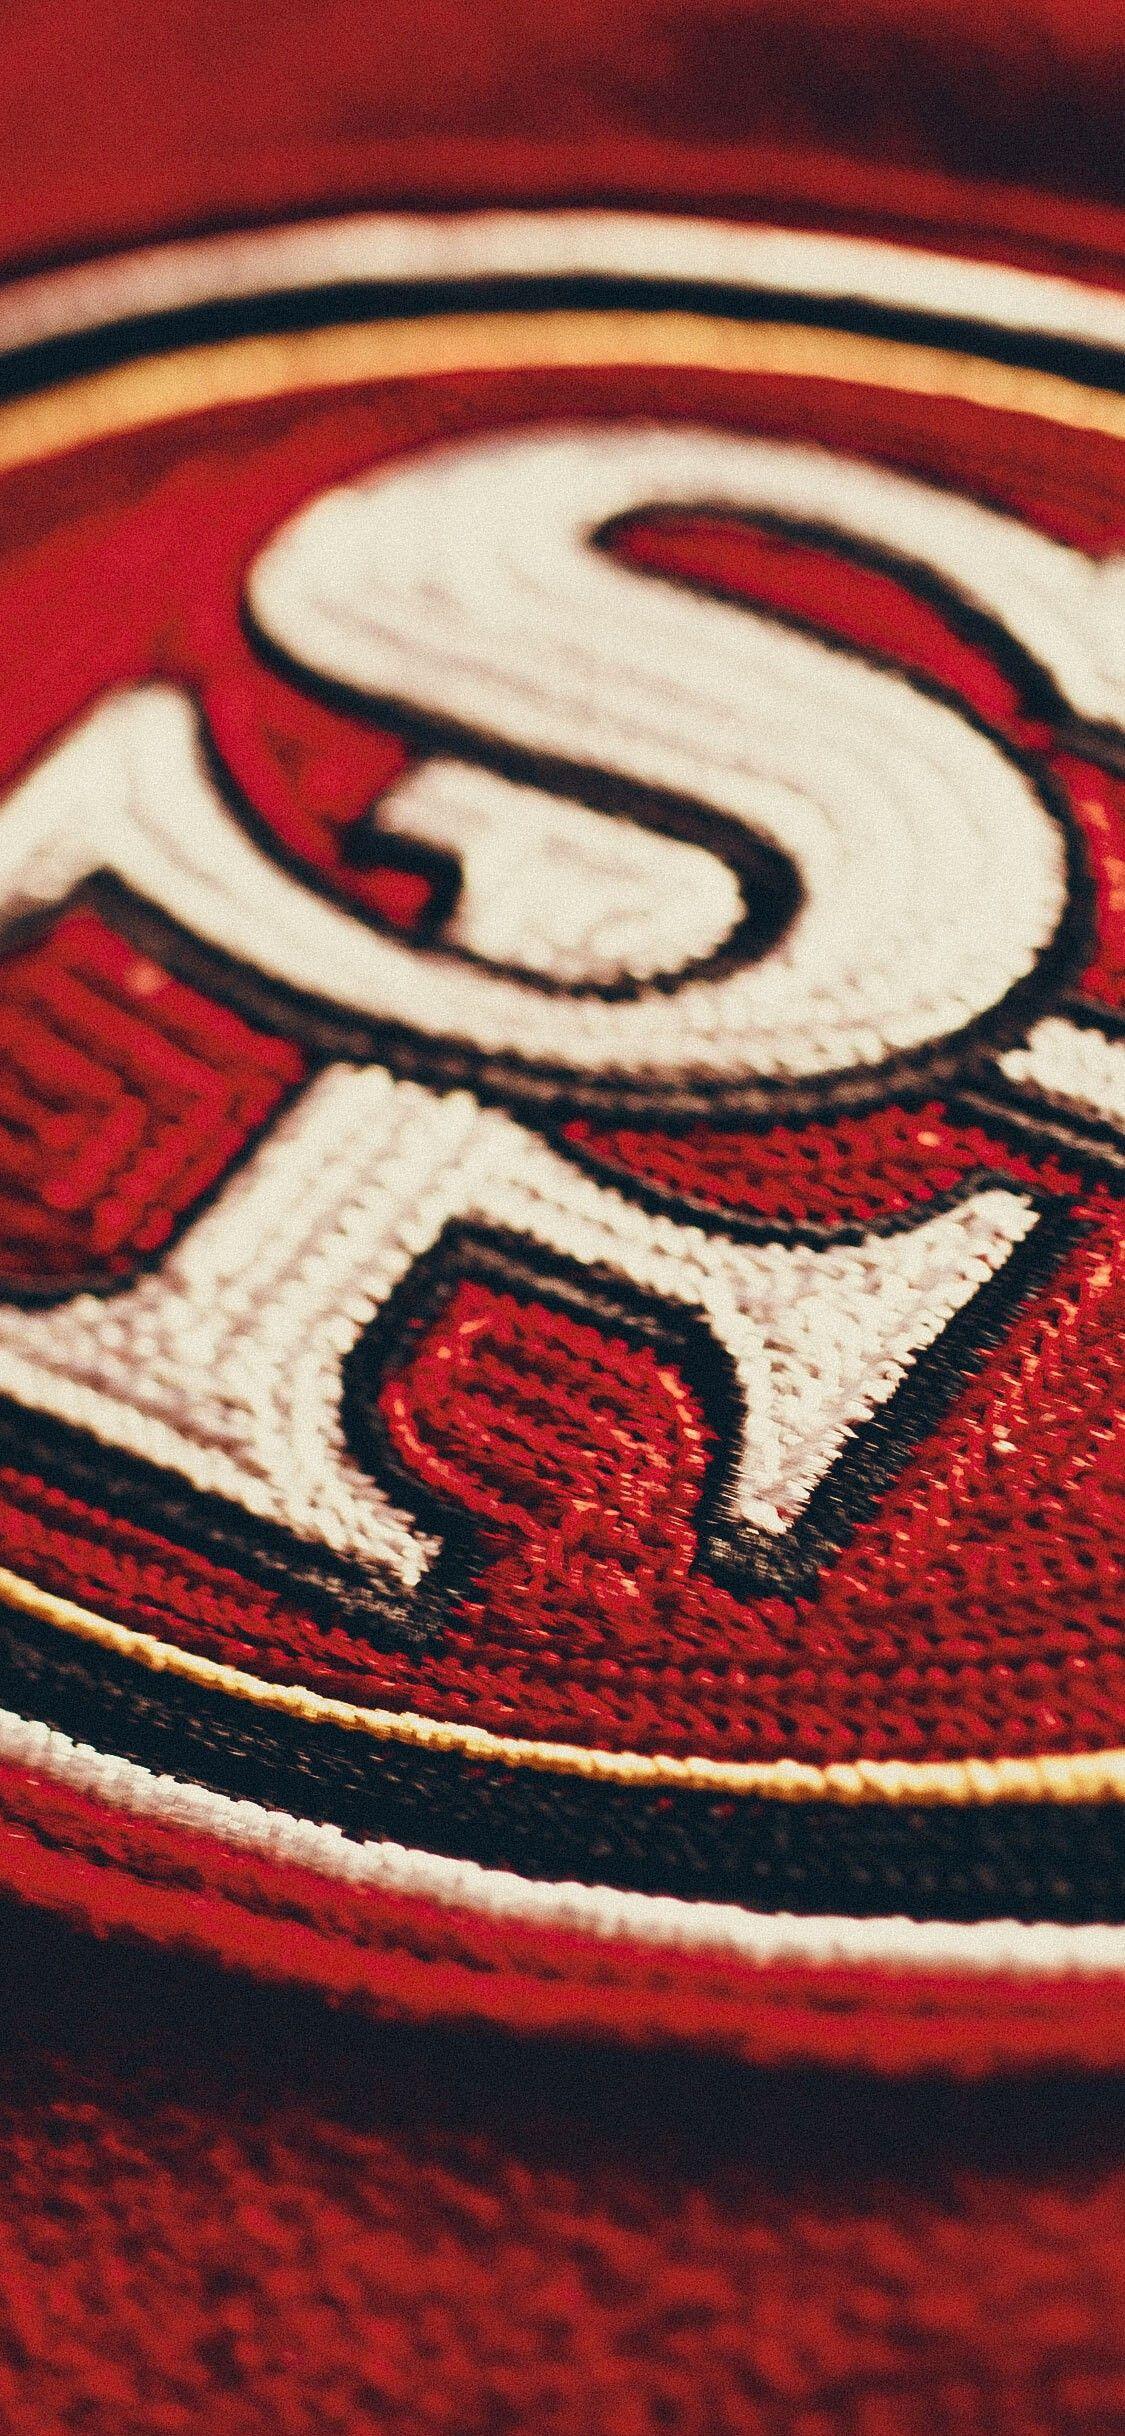 San Francisco 49ers Wallpaper 49ers Wallpaper San Francisco 49ers Wallpapers San Francisco 49ers Logo